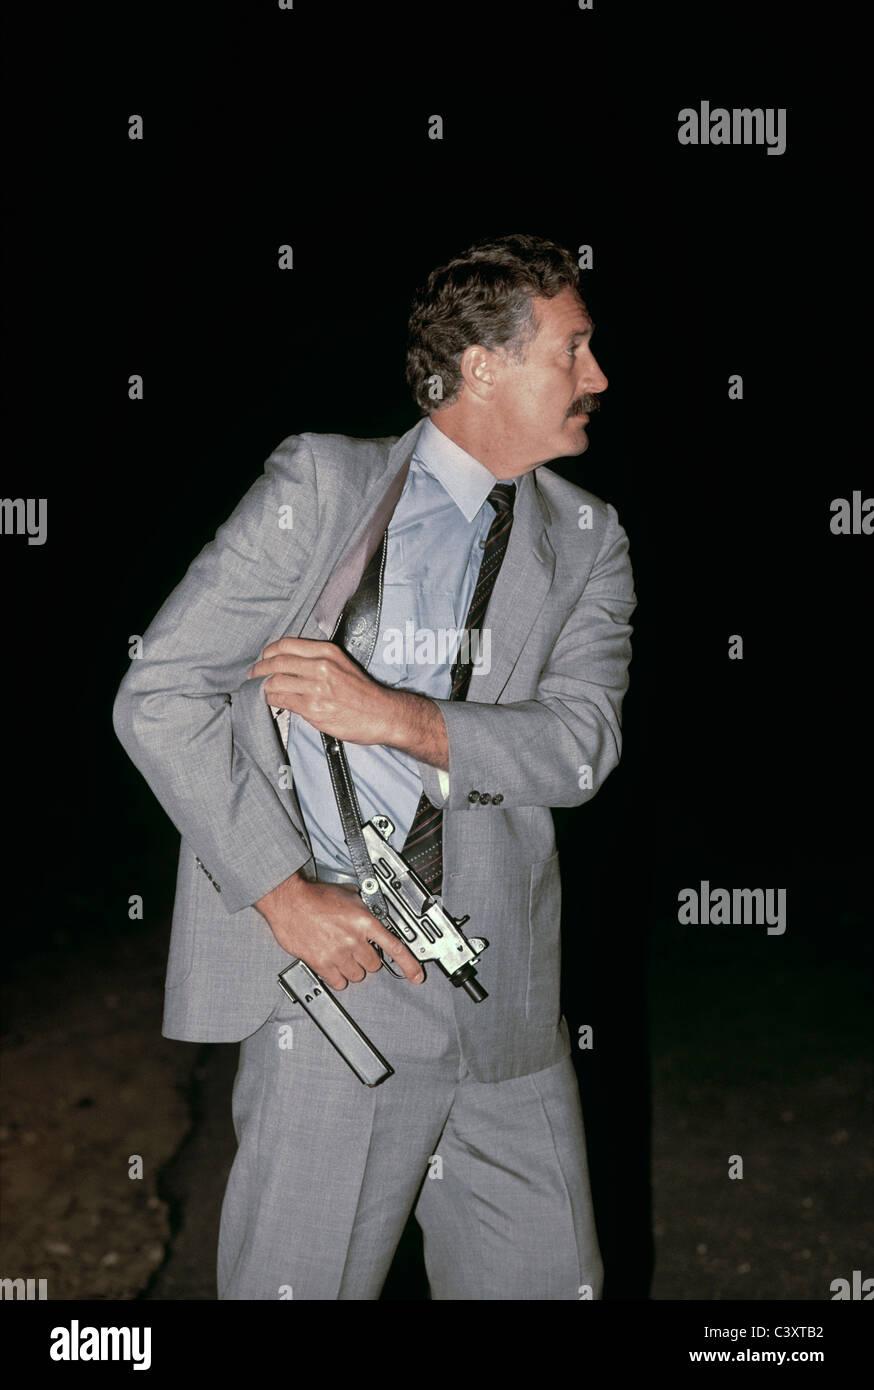 Israeli Secret Service agent draws an uzi pistol from his shoulder holster. IsraelStock Photo